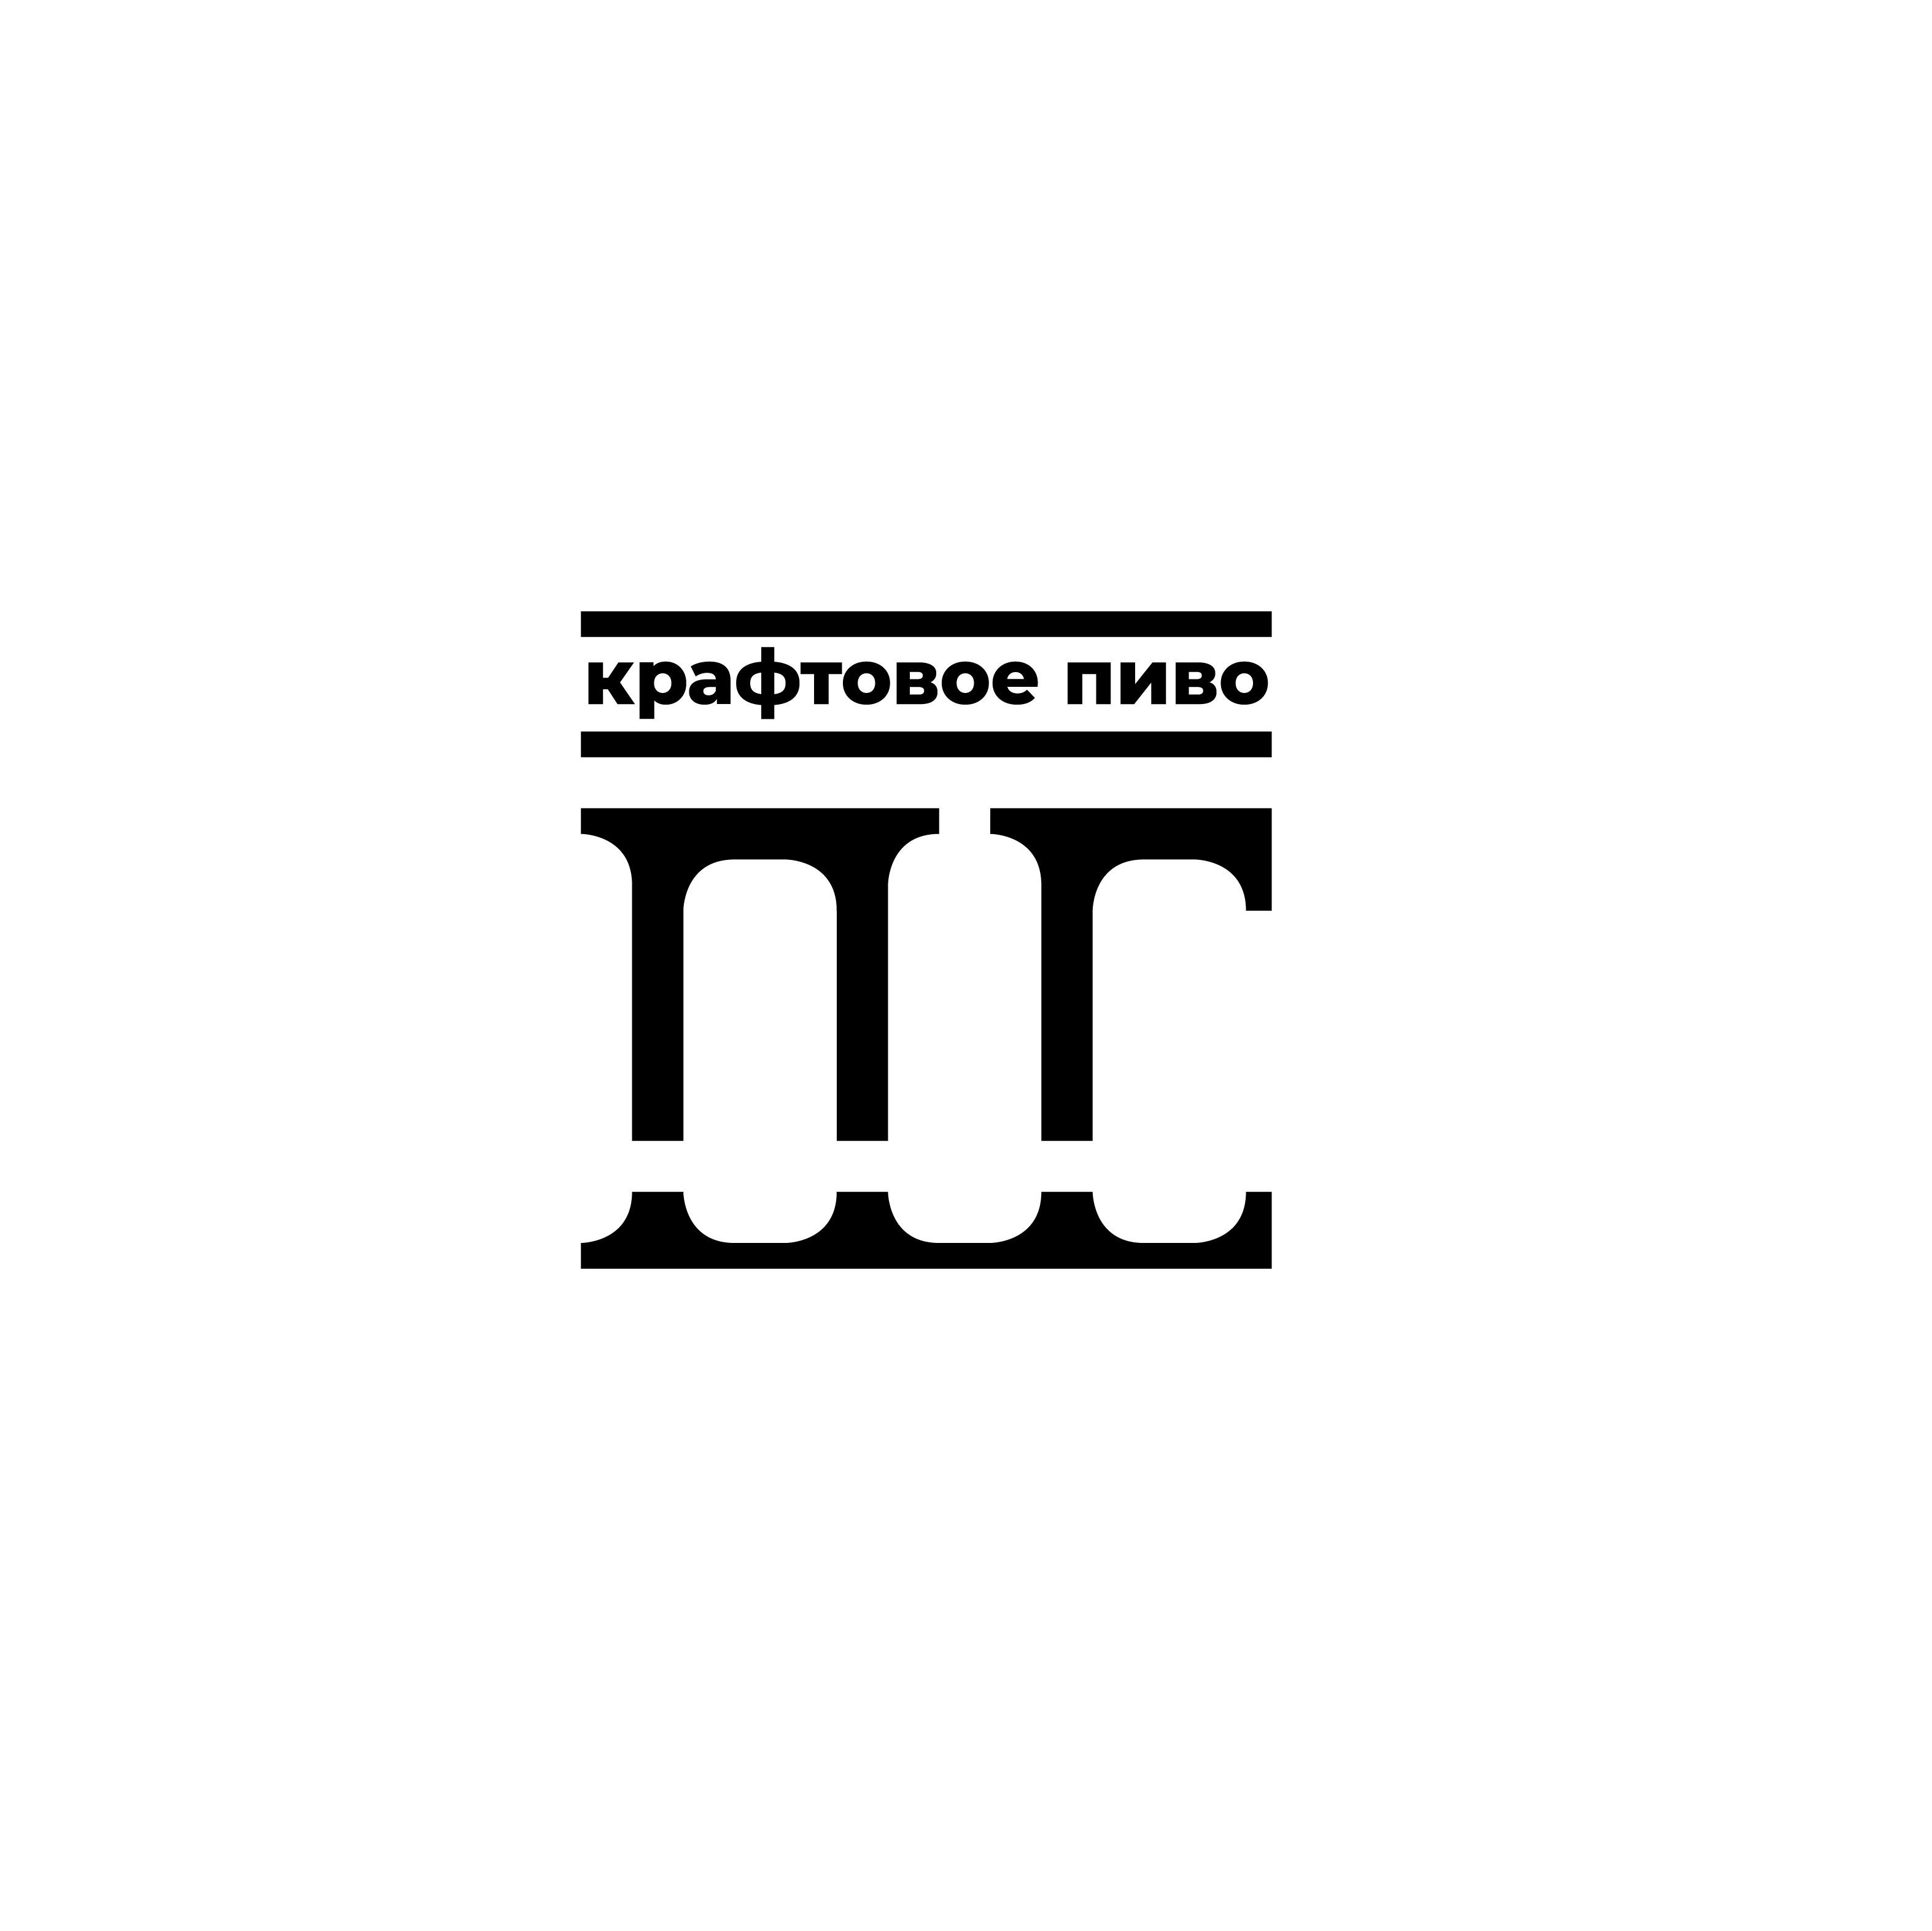 Логотип для Крафтовой Пивоварни фото f_2325cacc5b530c3e.jpg